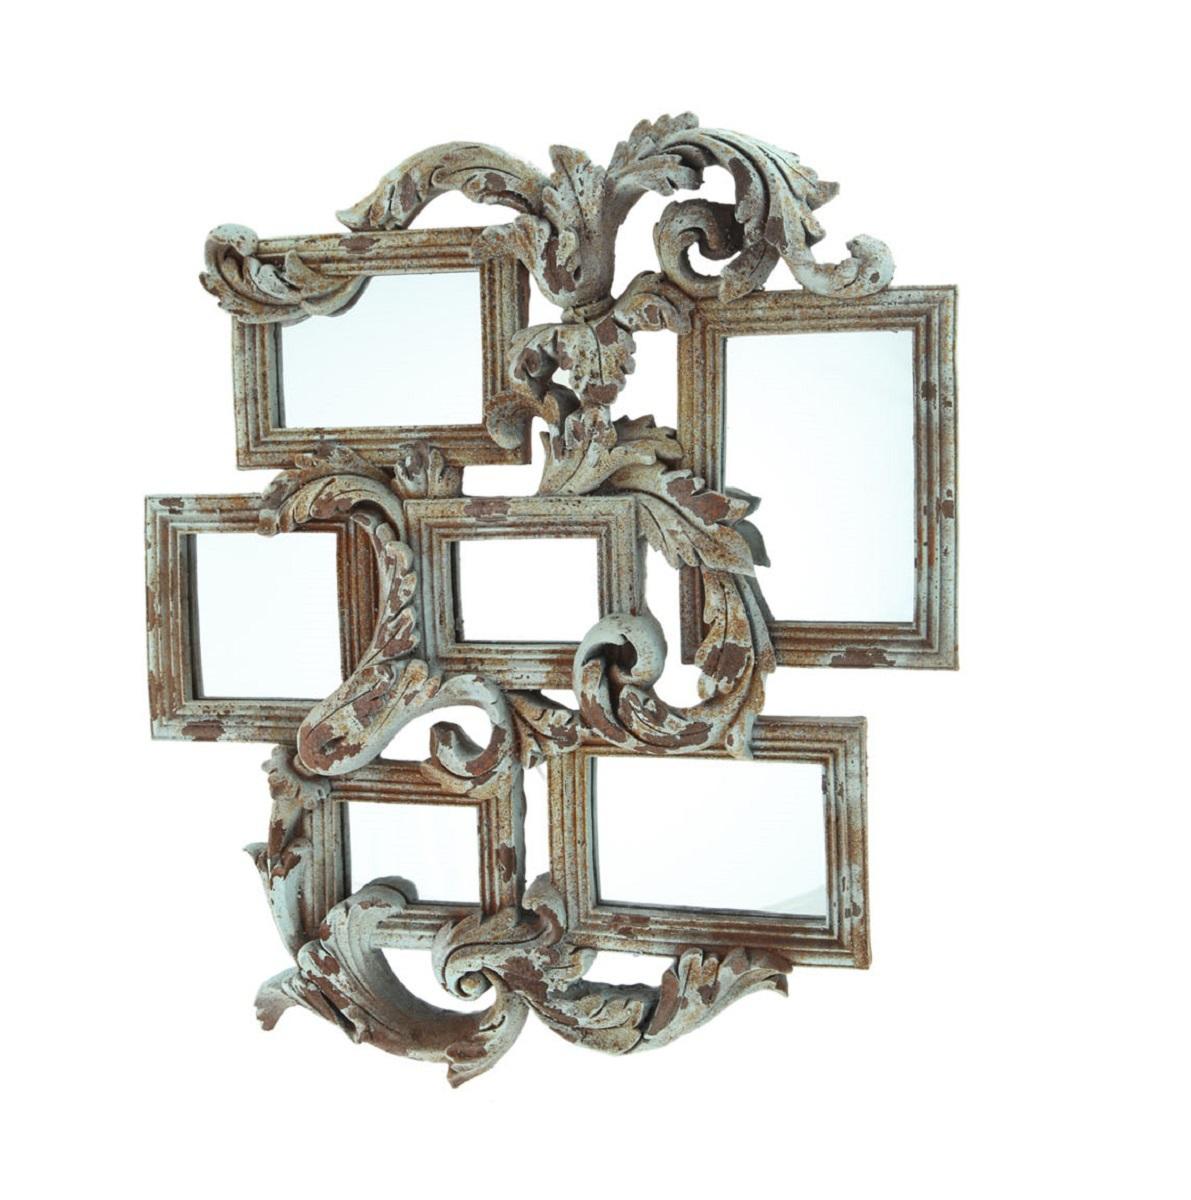 Зеркала Зеркало декоративное Decor 78083AE zerkalo-dekorativnoe-decor-78083ae-kitay.jpg